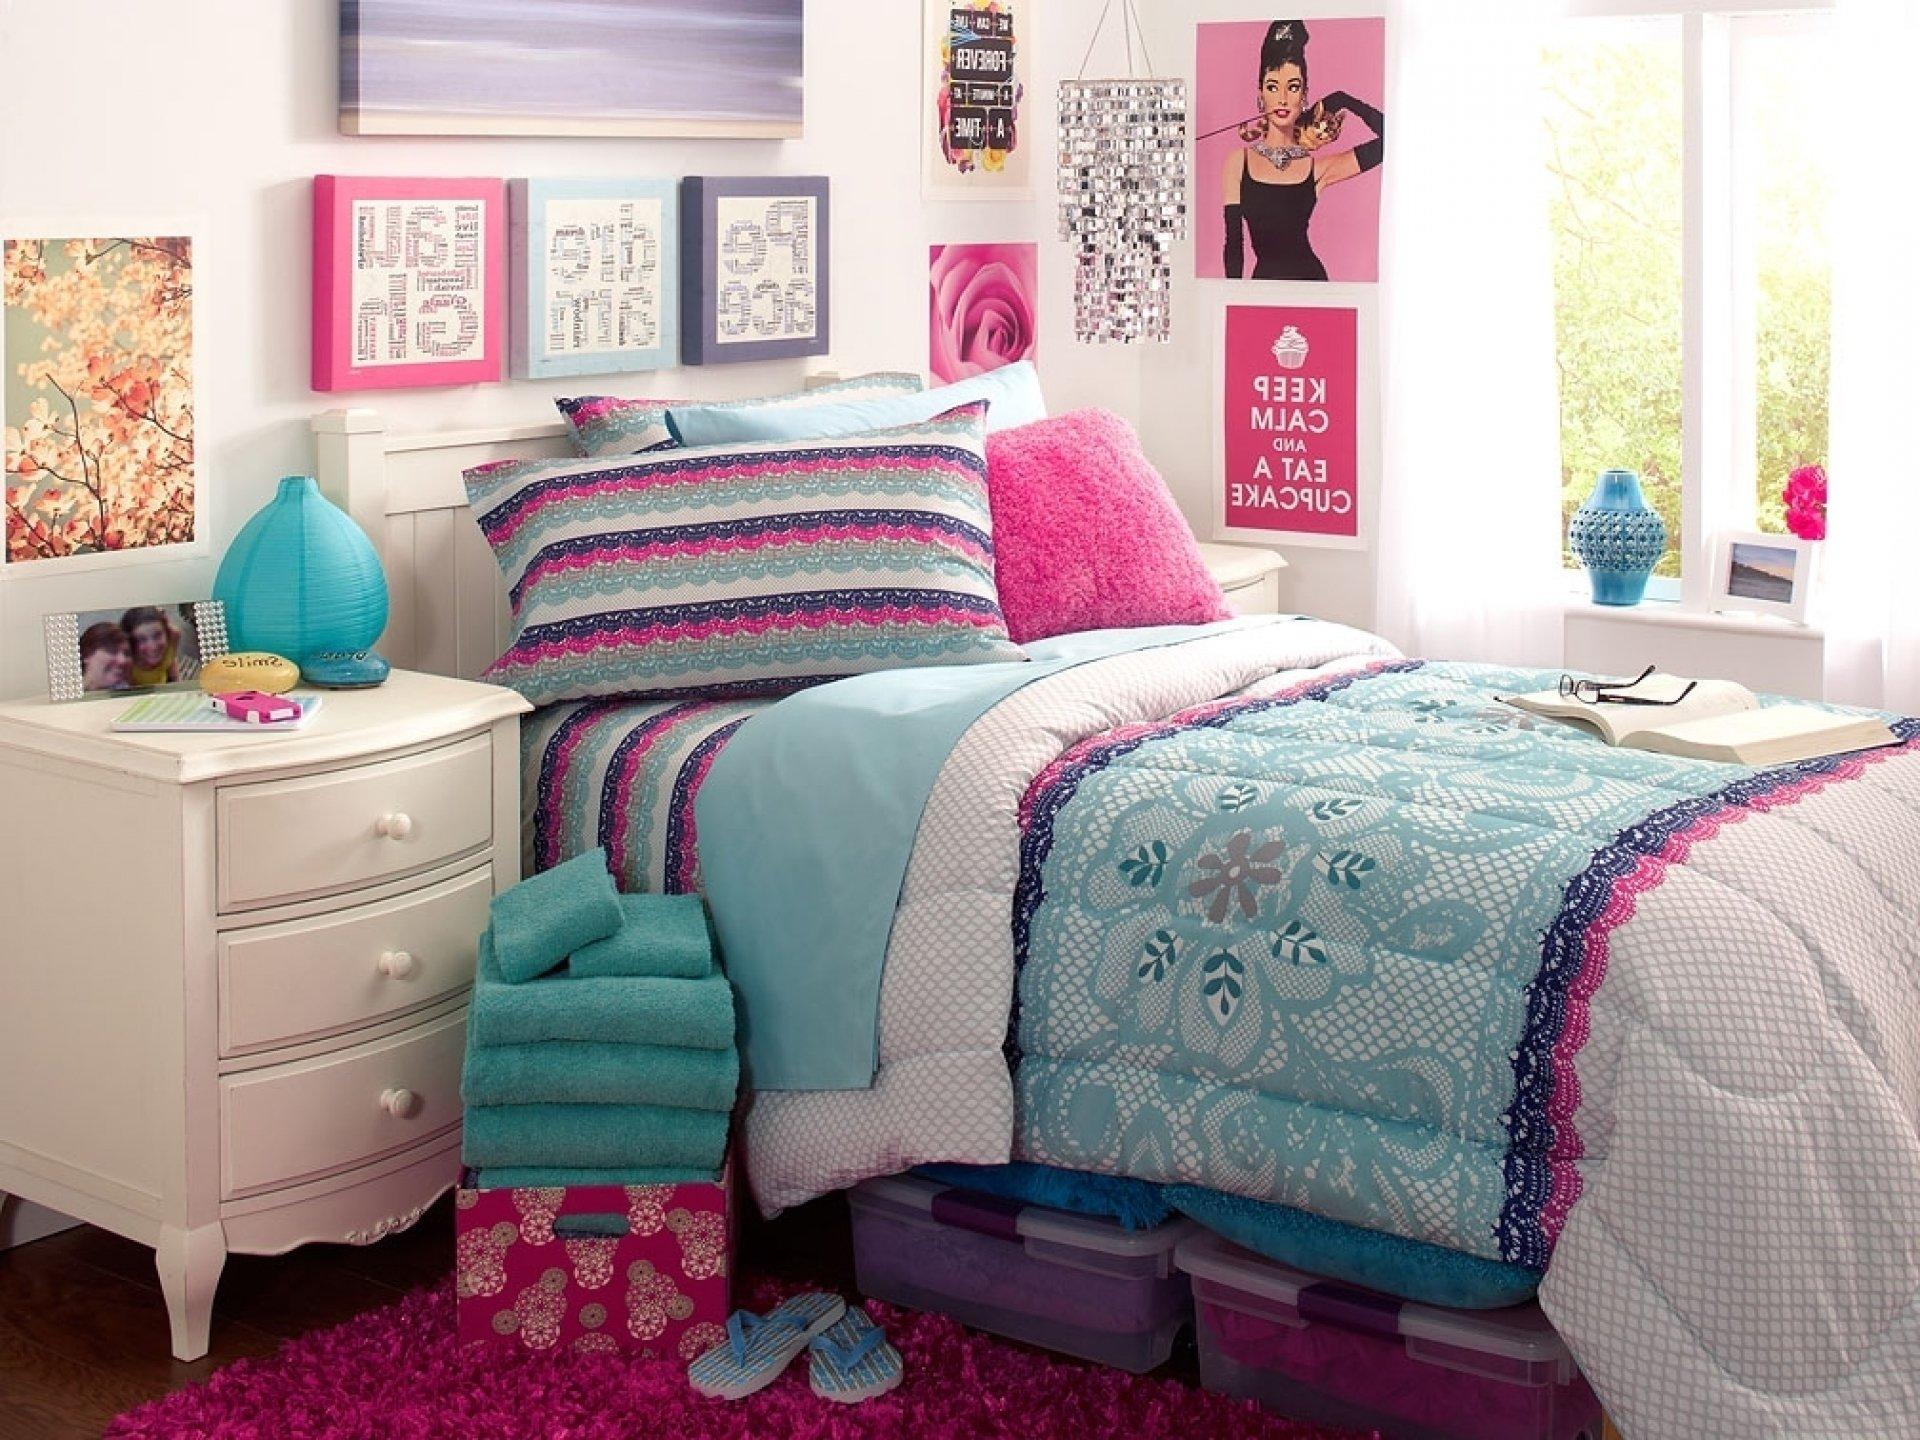 girly girl bedroom ideas • bedroom ideas